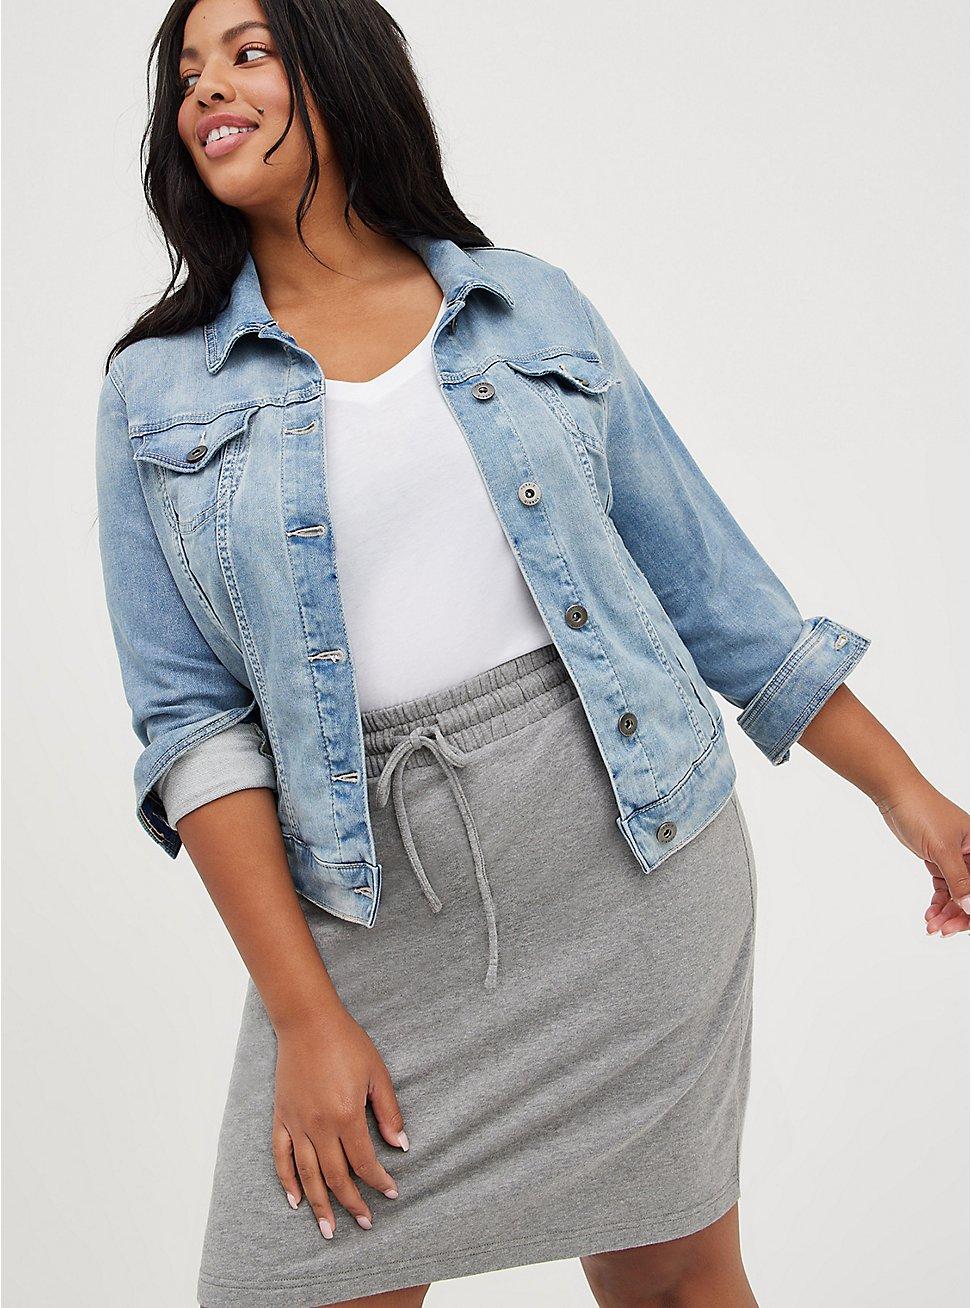 Denim Jacket - Bossa Knit Medium Wash, DENIM, hi-res